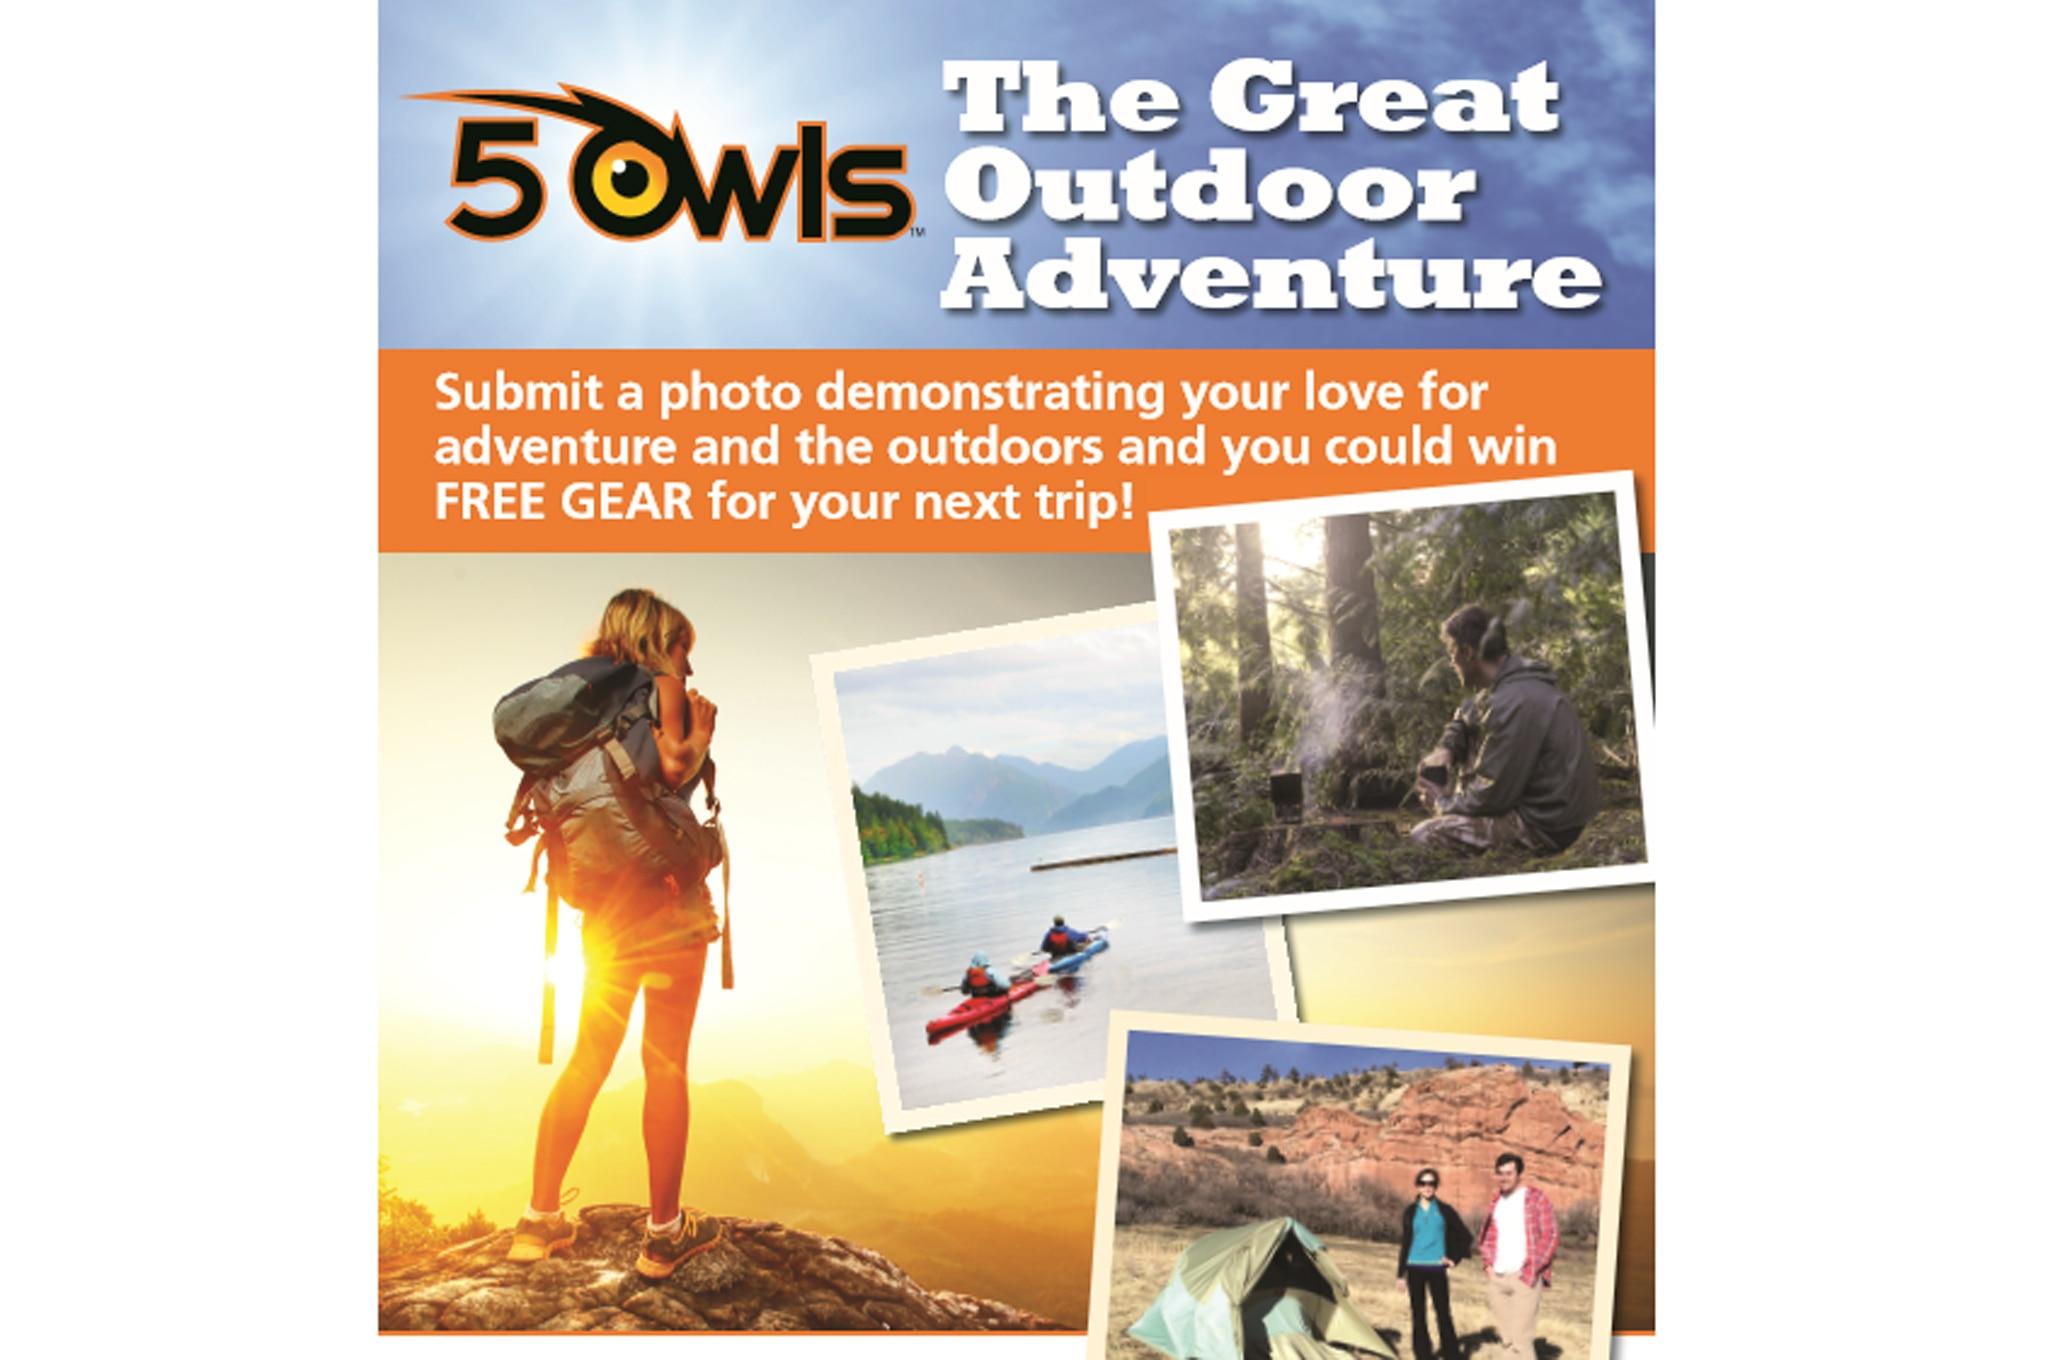 5 Owls Outdoor Adventure Photo Contest